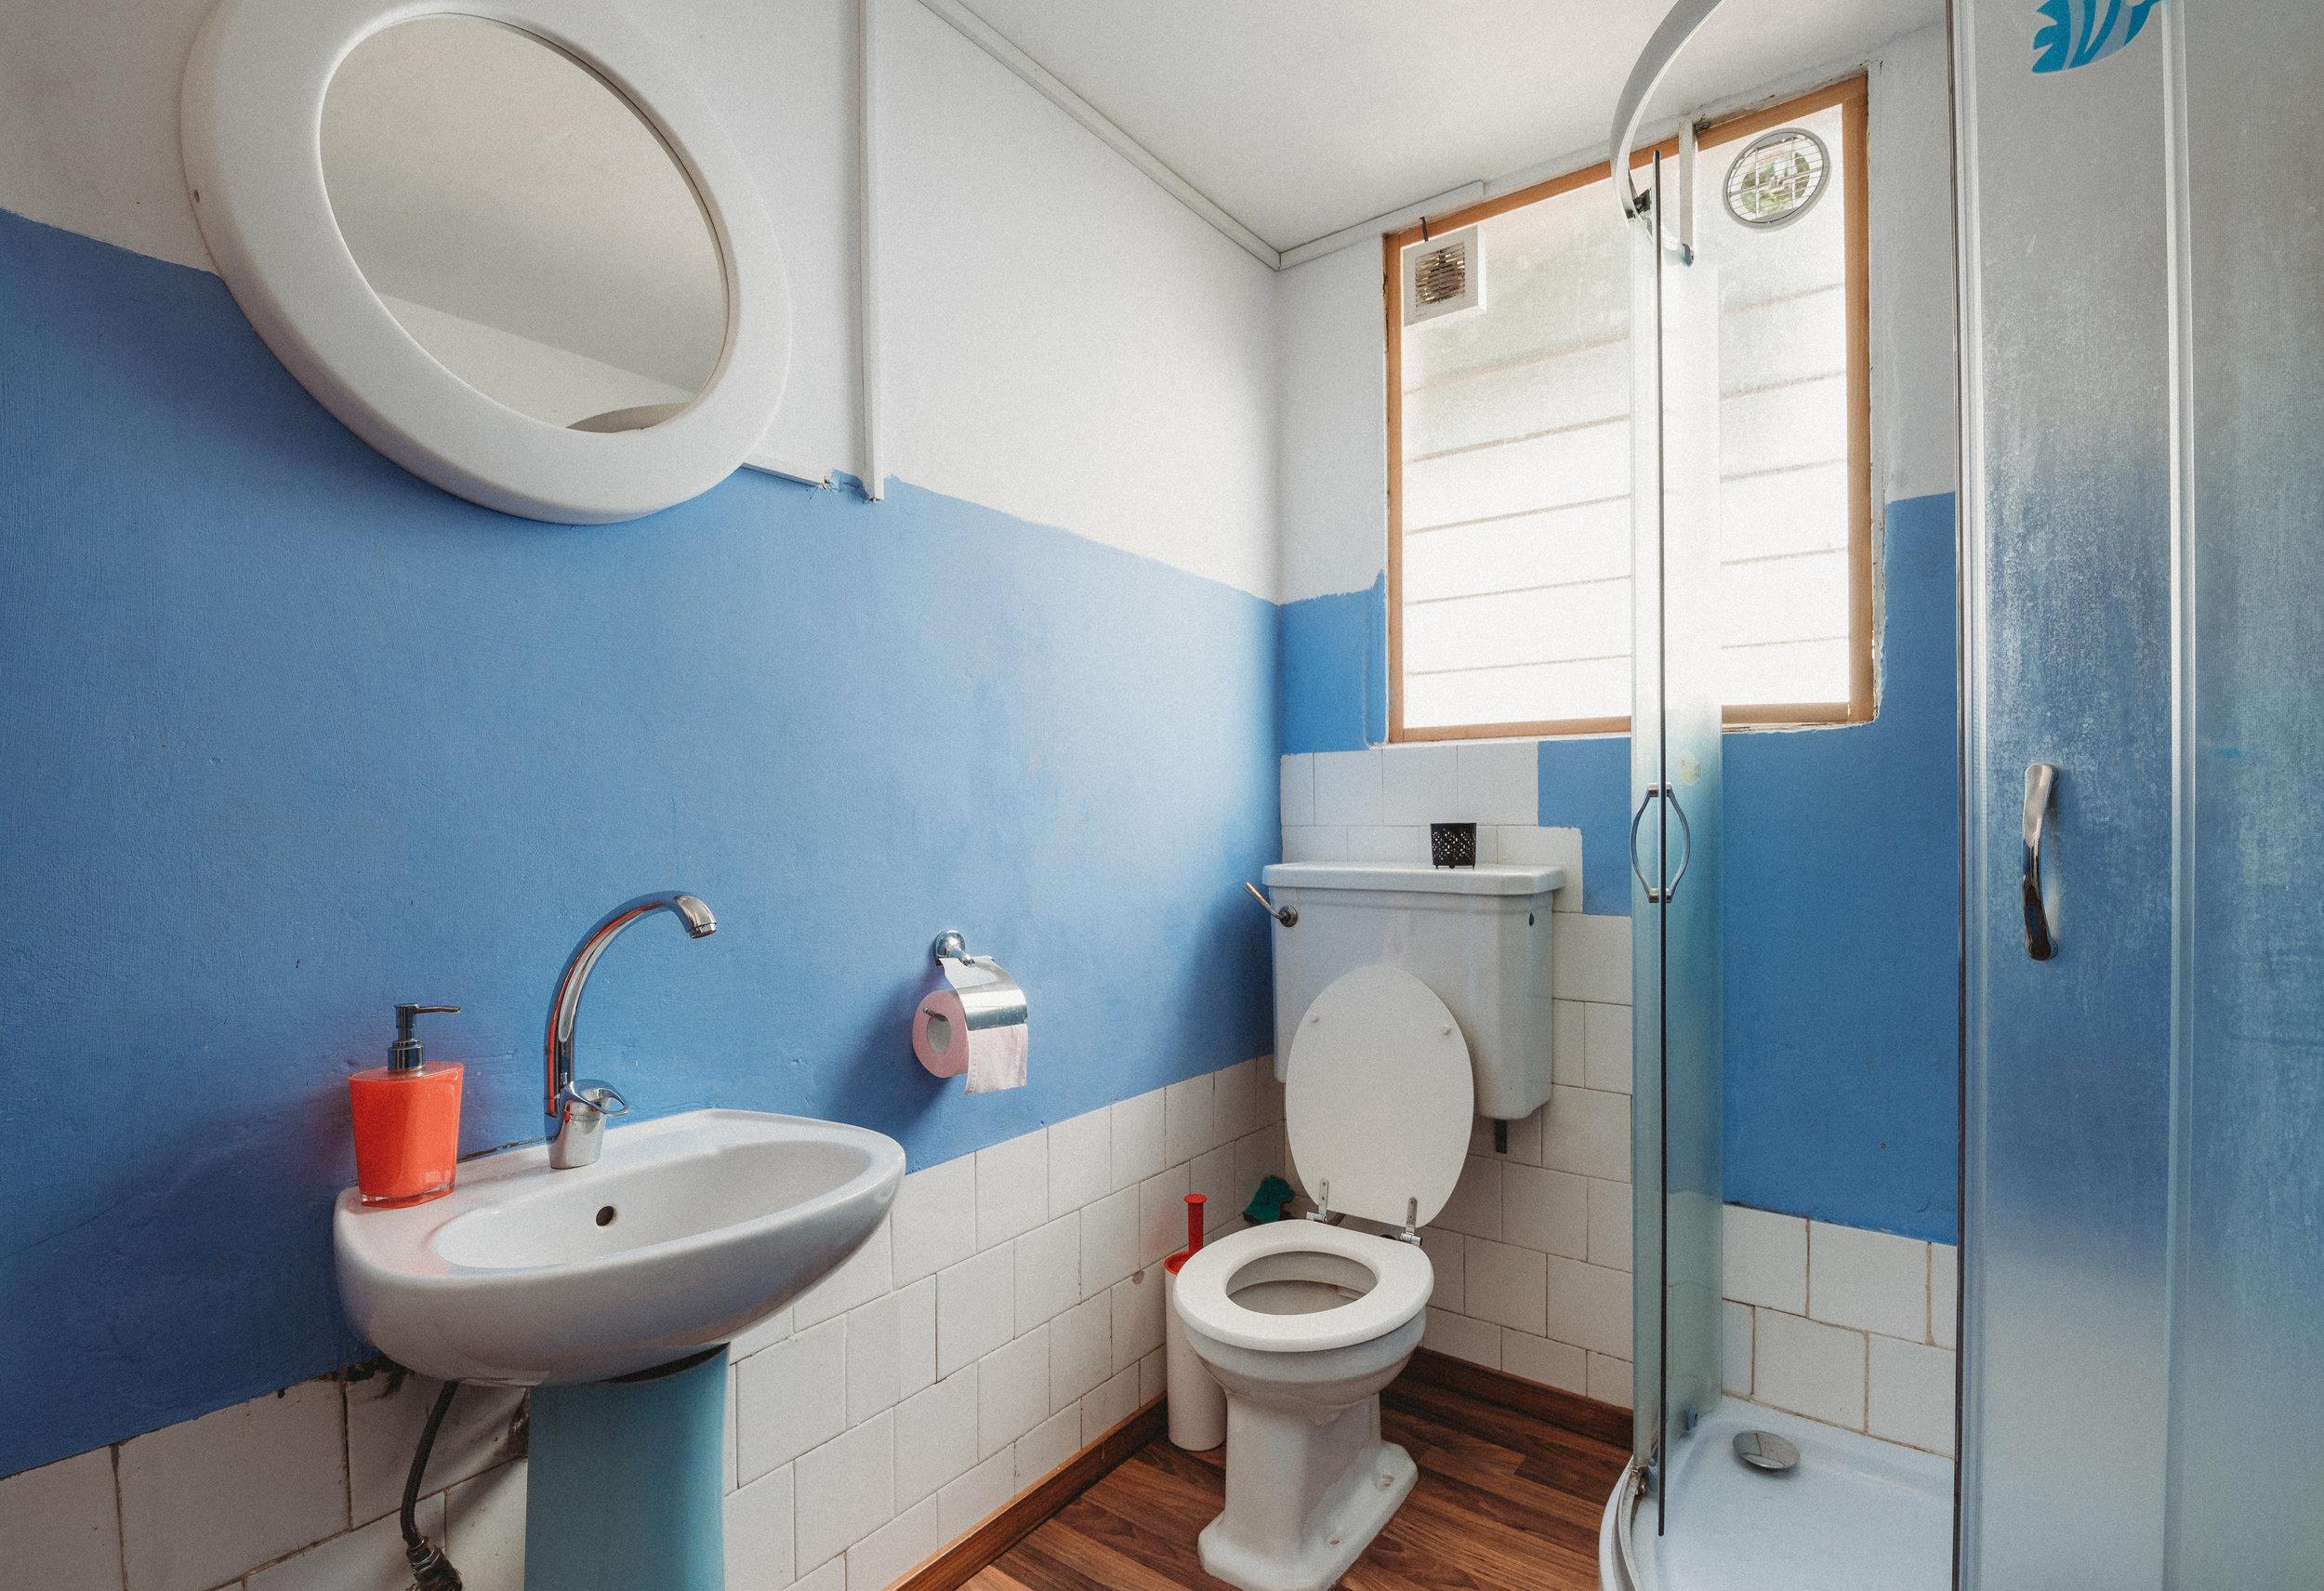 voyedge rx europe bathrooms cost money do they